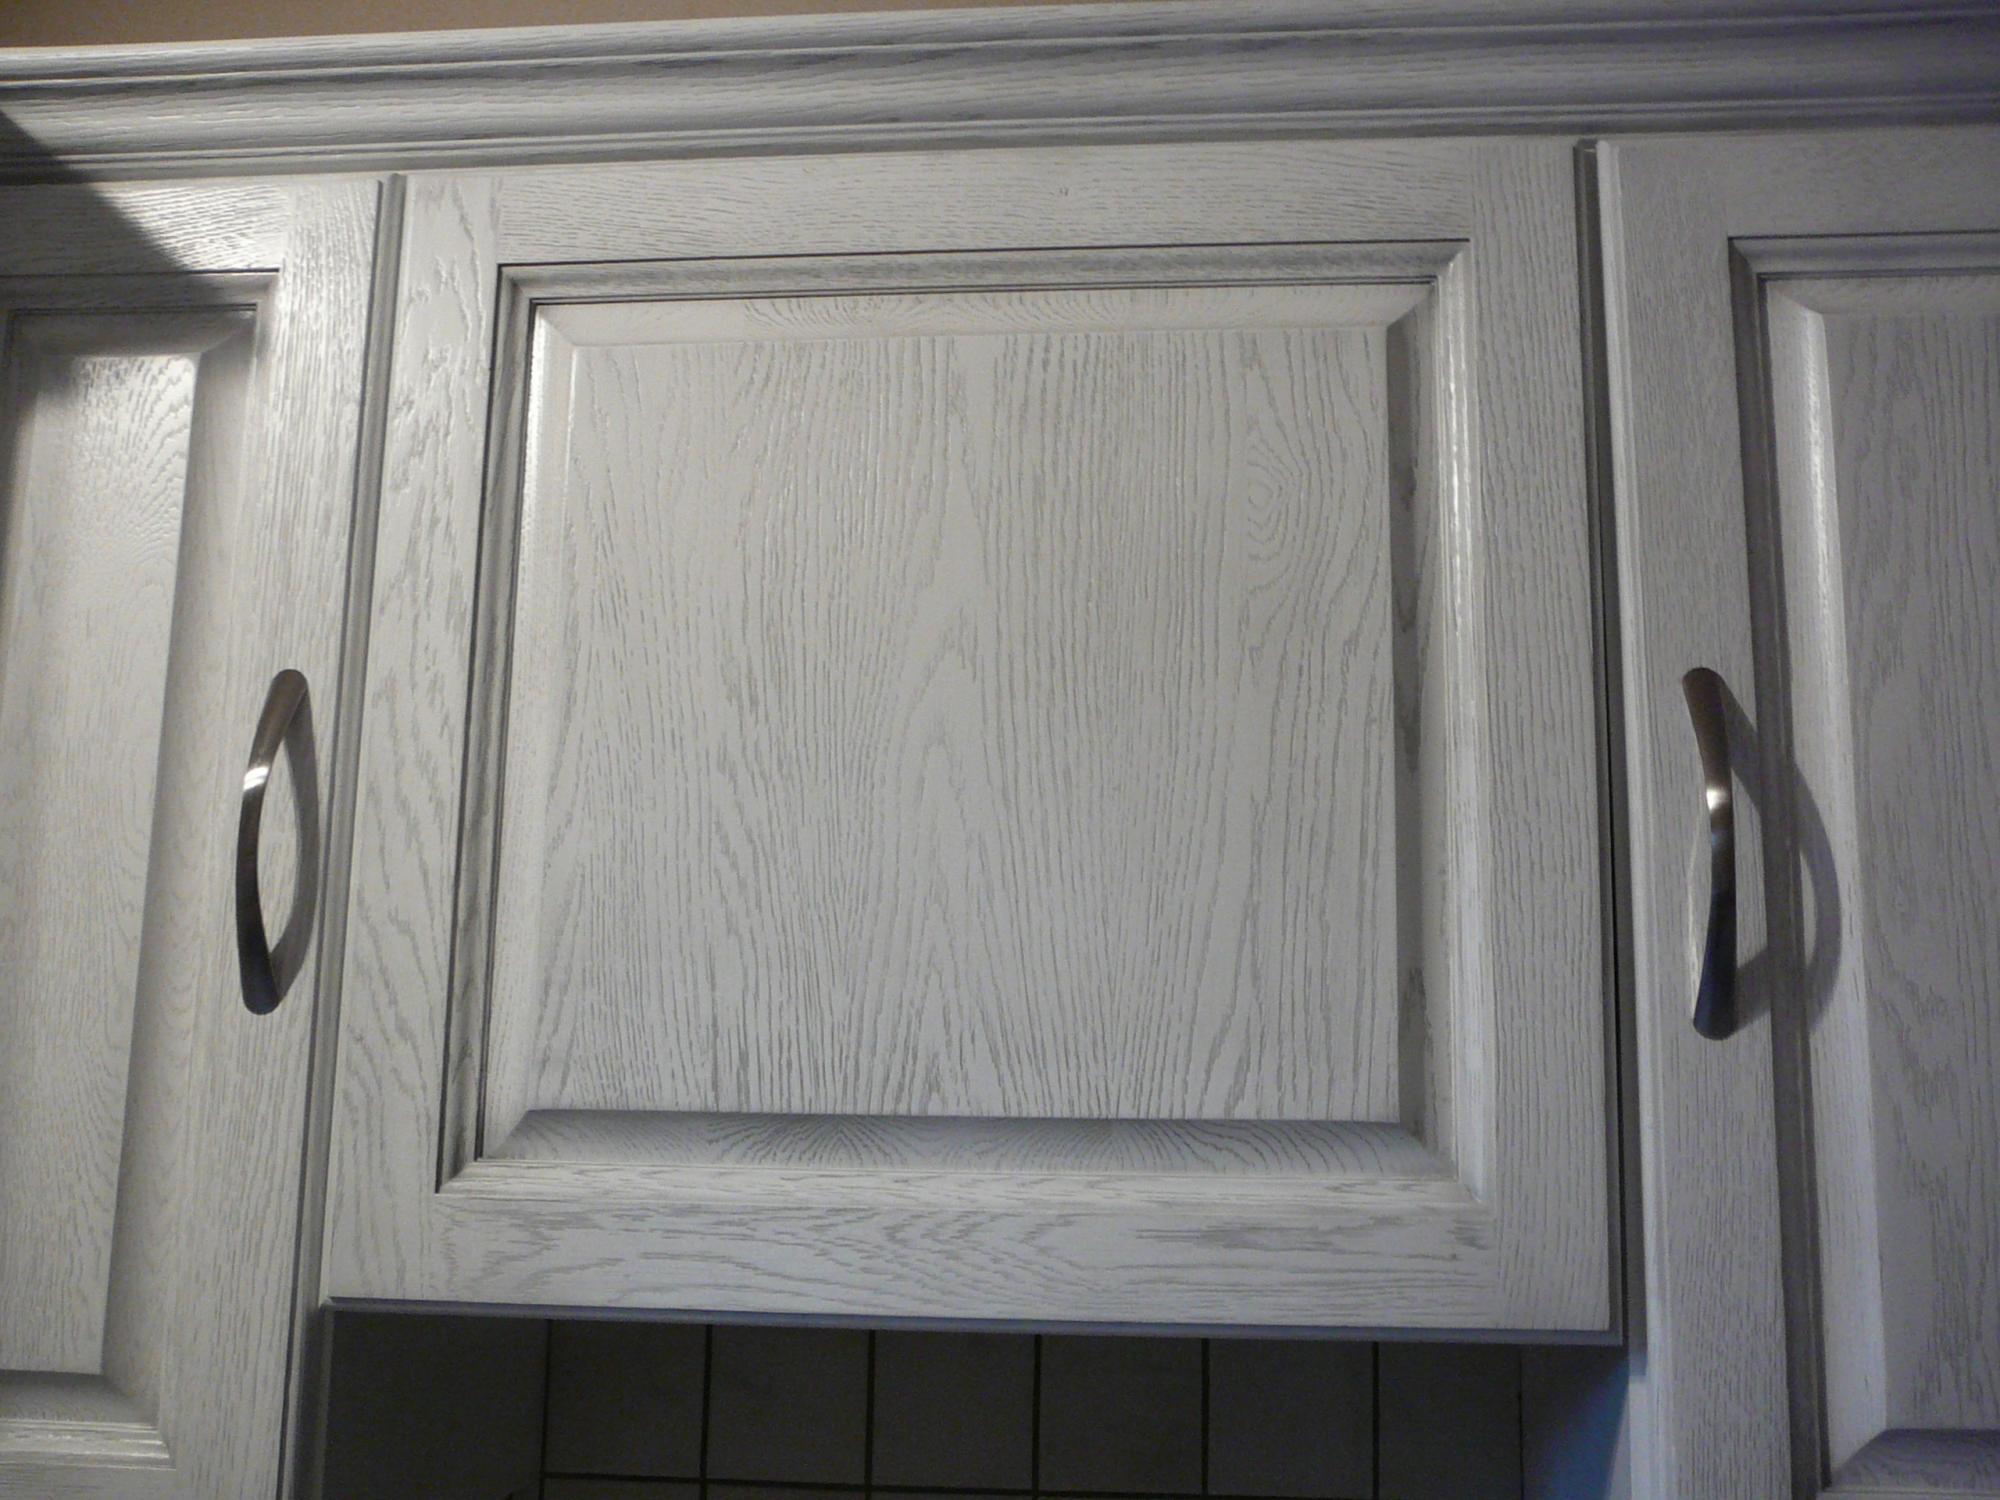 peinture cuisine effet vieilli id es de travaux. Black Bedroom Furniture Sets. Home Design Ideas